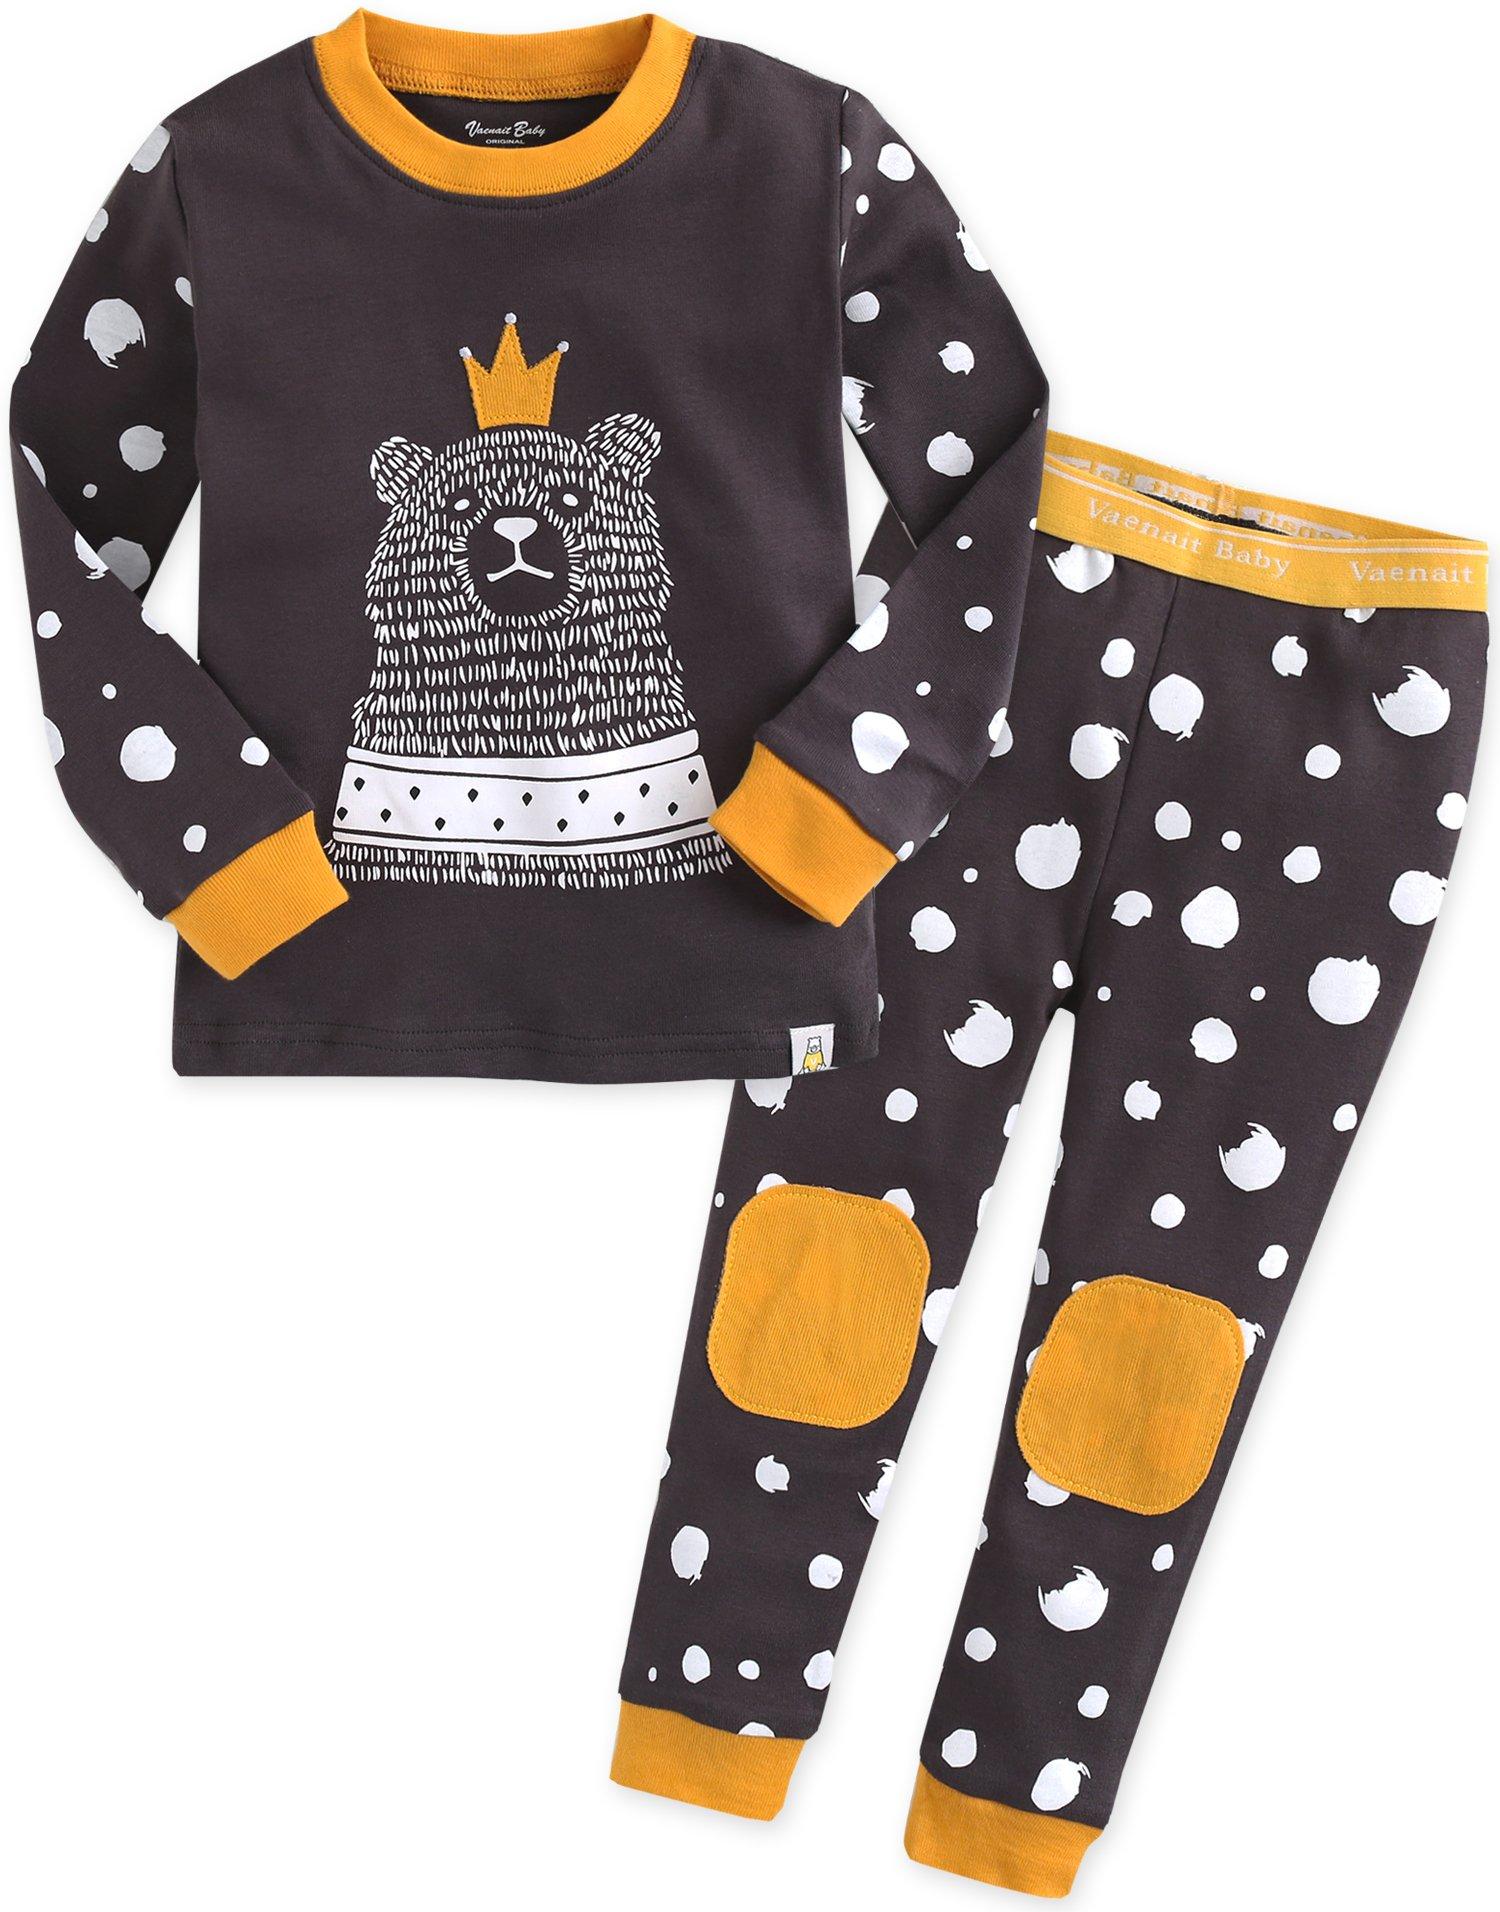 Vaenait baby 12M-7T Kids Boys Sleepwear Pajama 2pcs Set The Love Bear XS